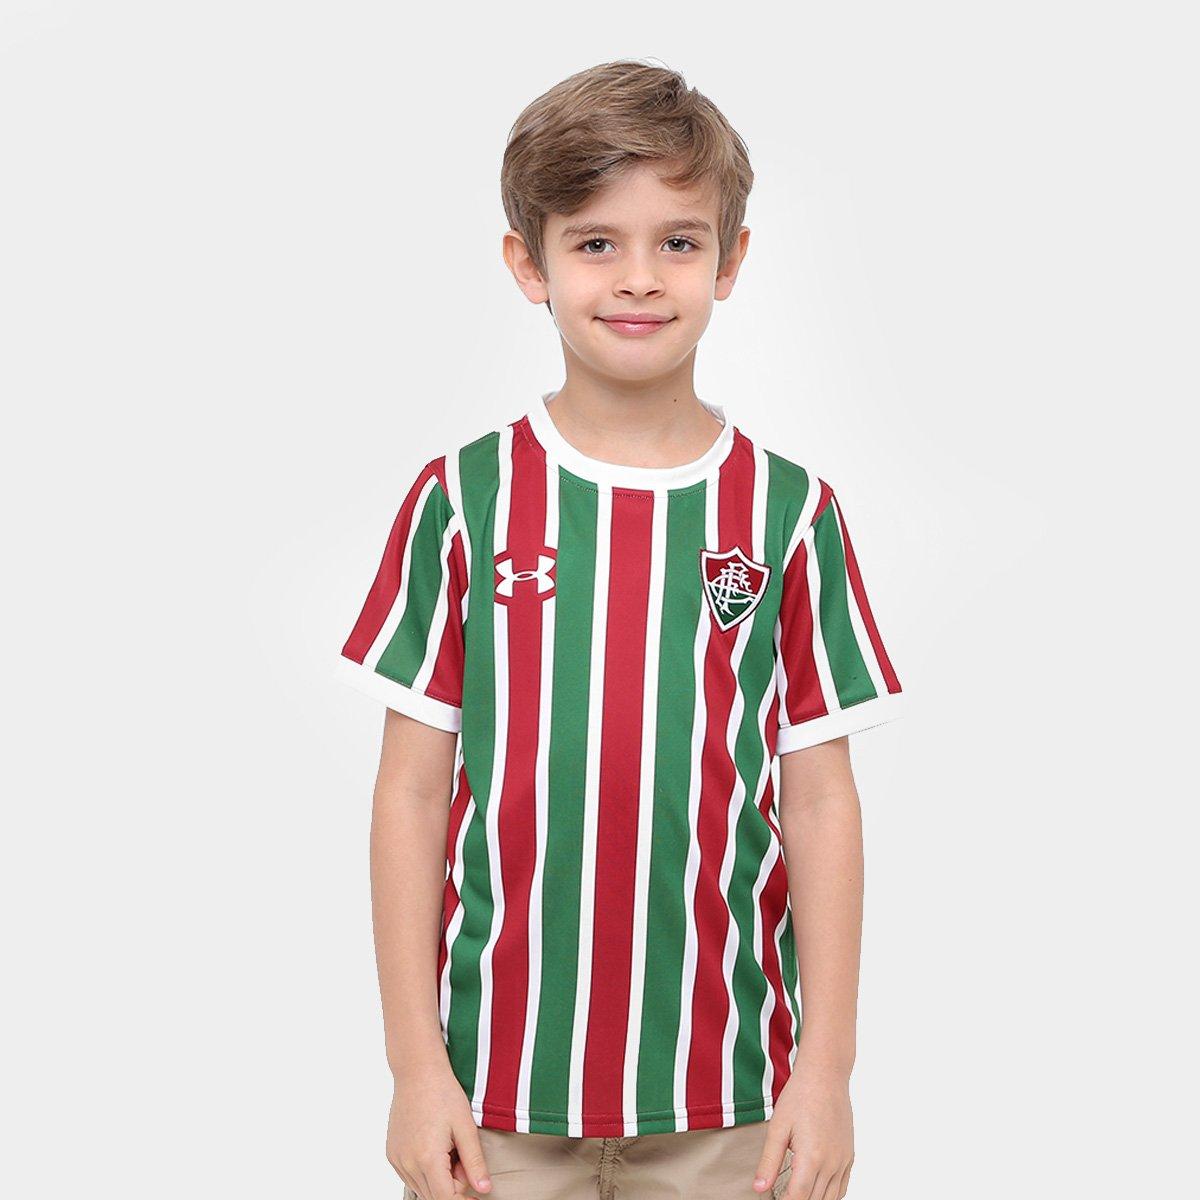 Camisa Fluminense I Infantil 17 18 s nº Torcedor Under Armour ecae22fc61c77